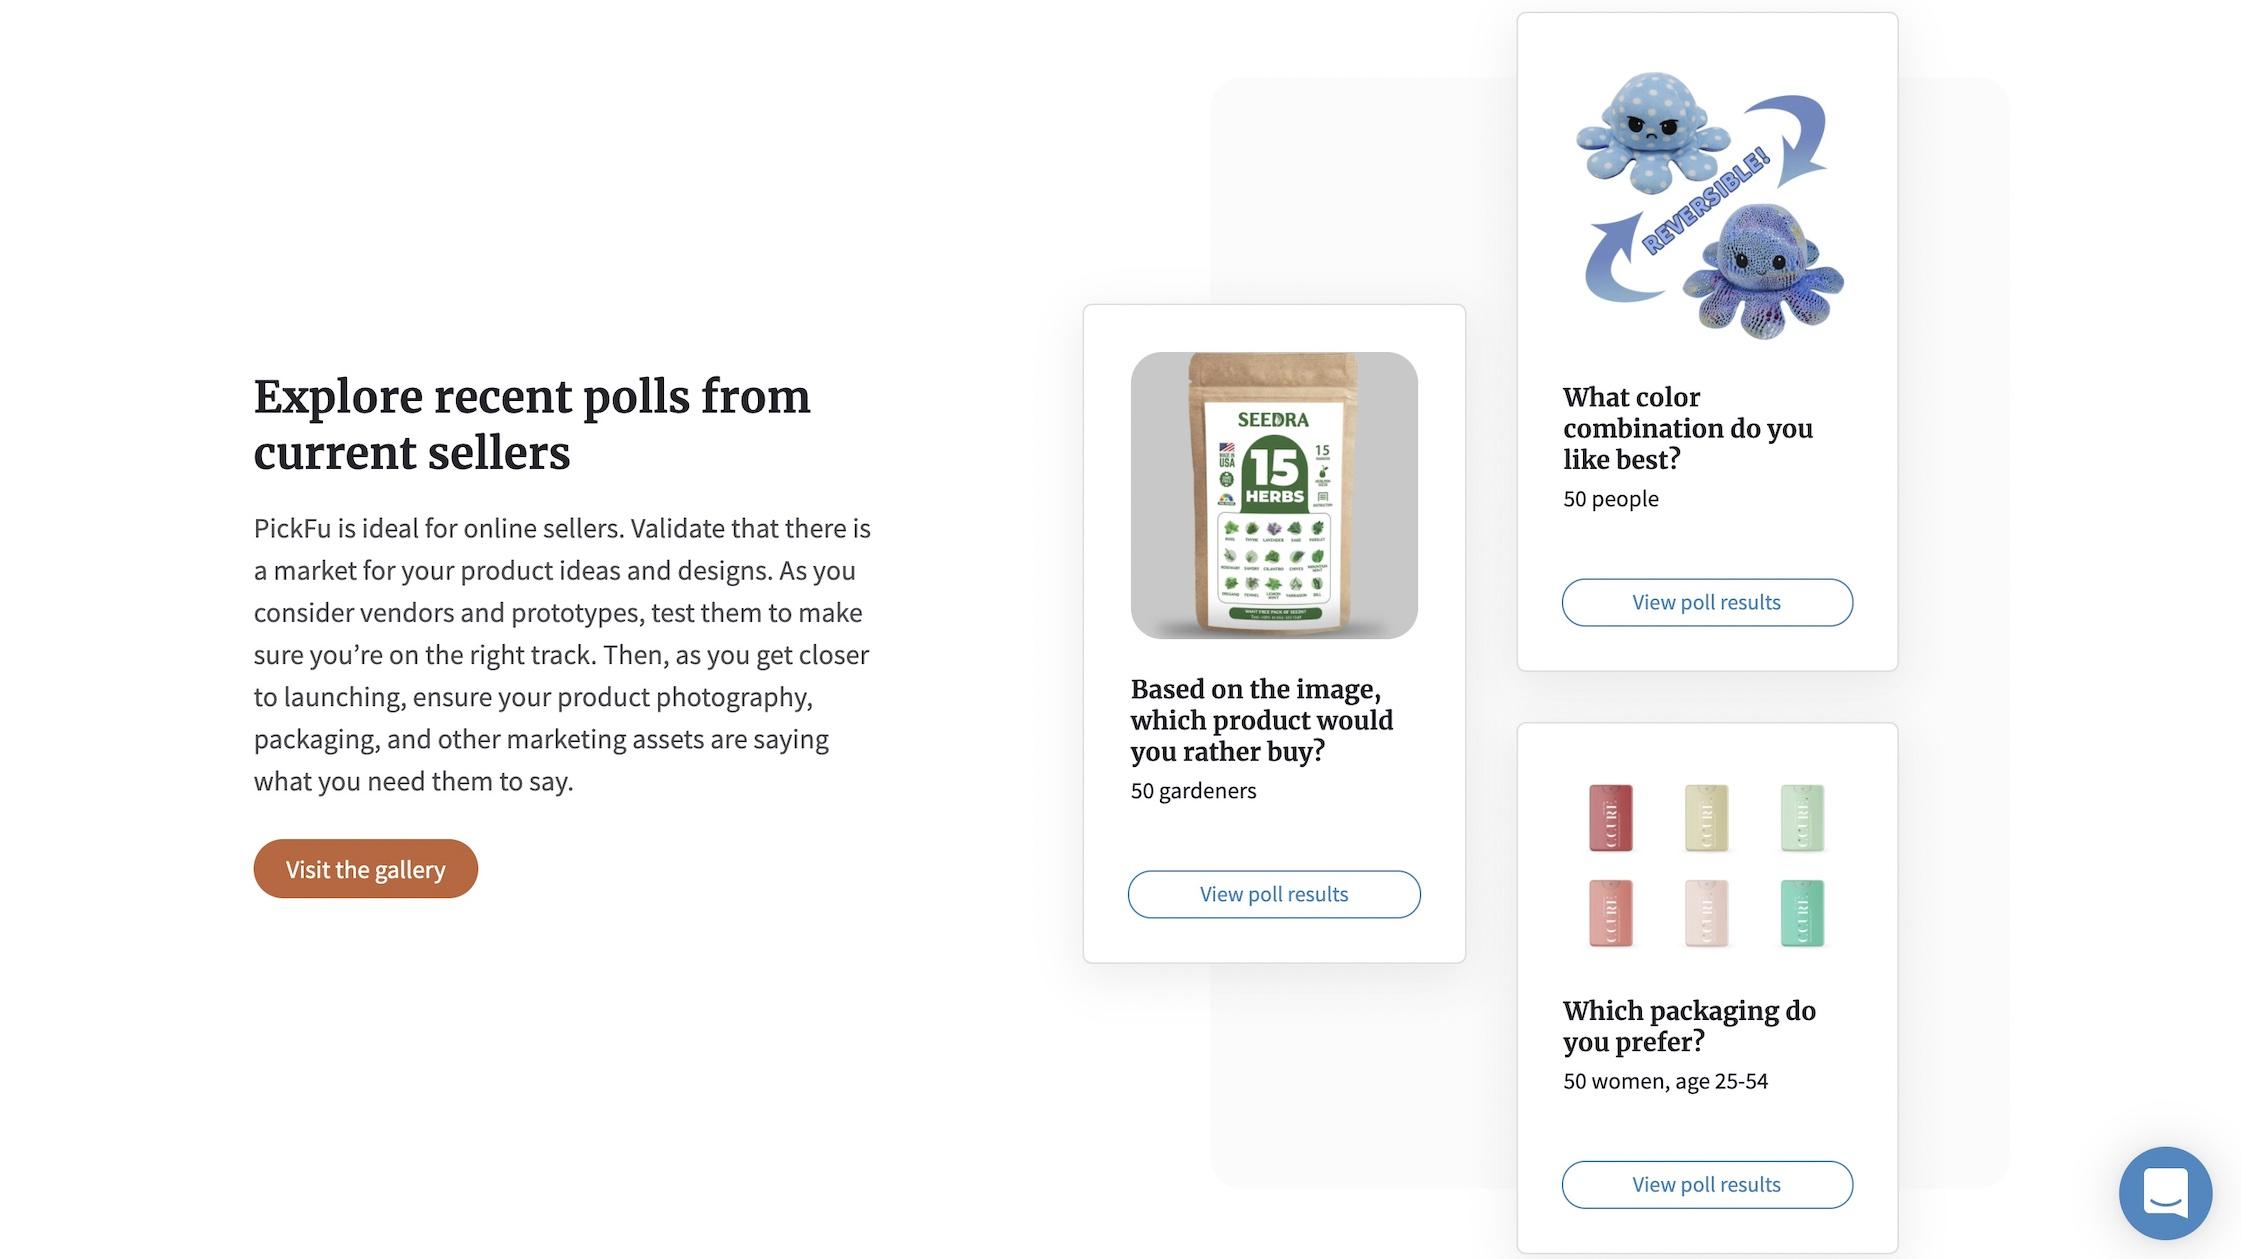 Image of recent PickFu polls